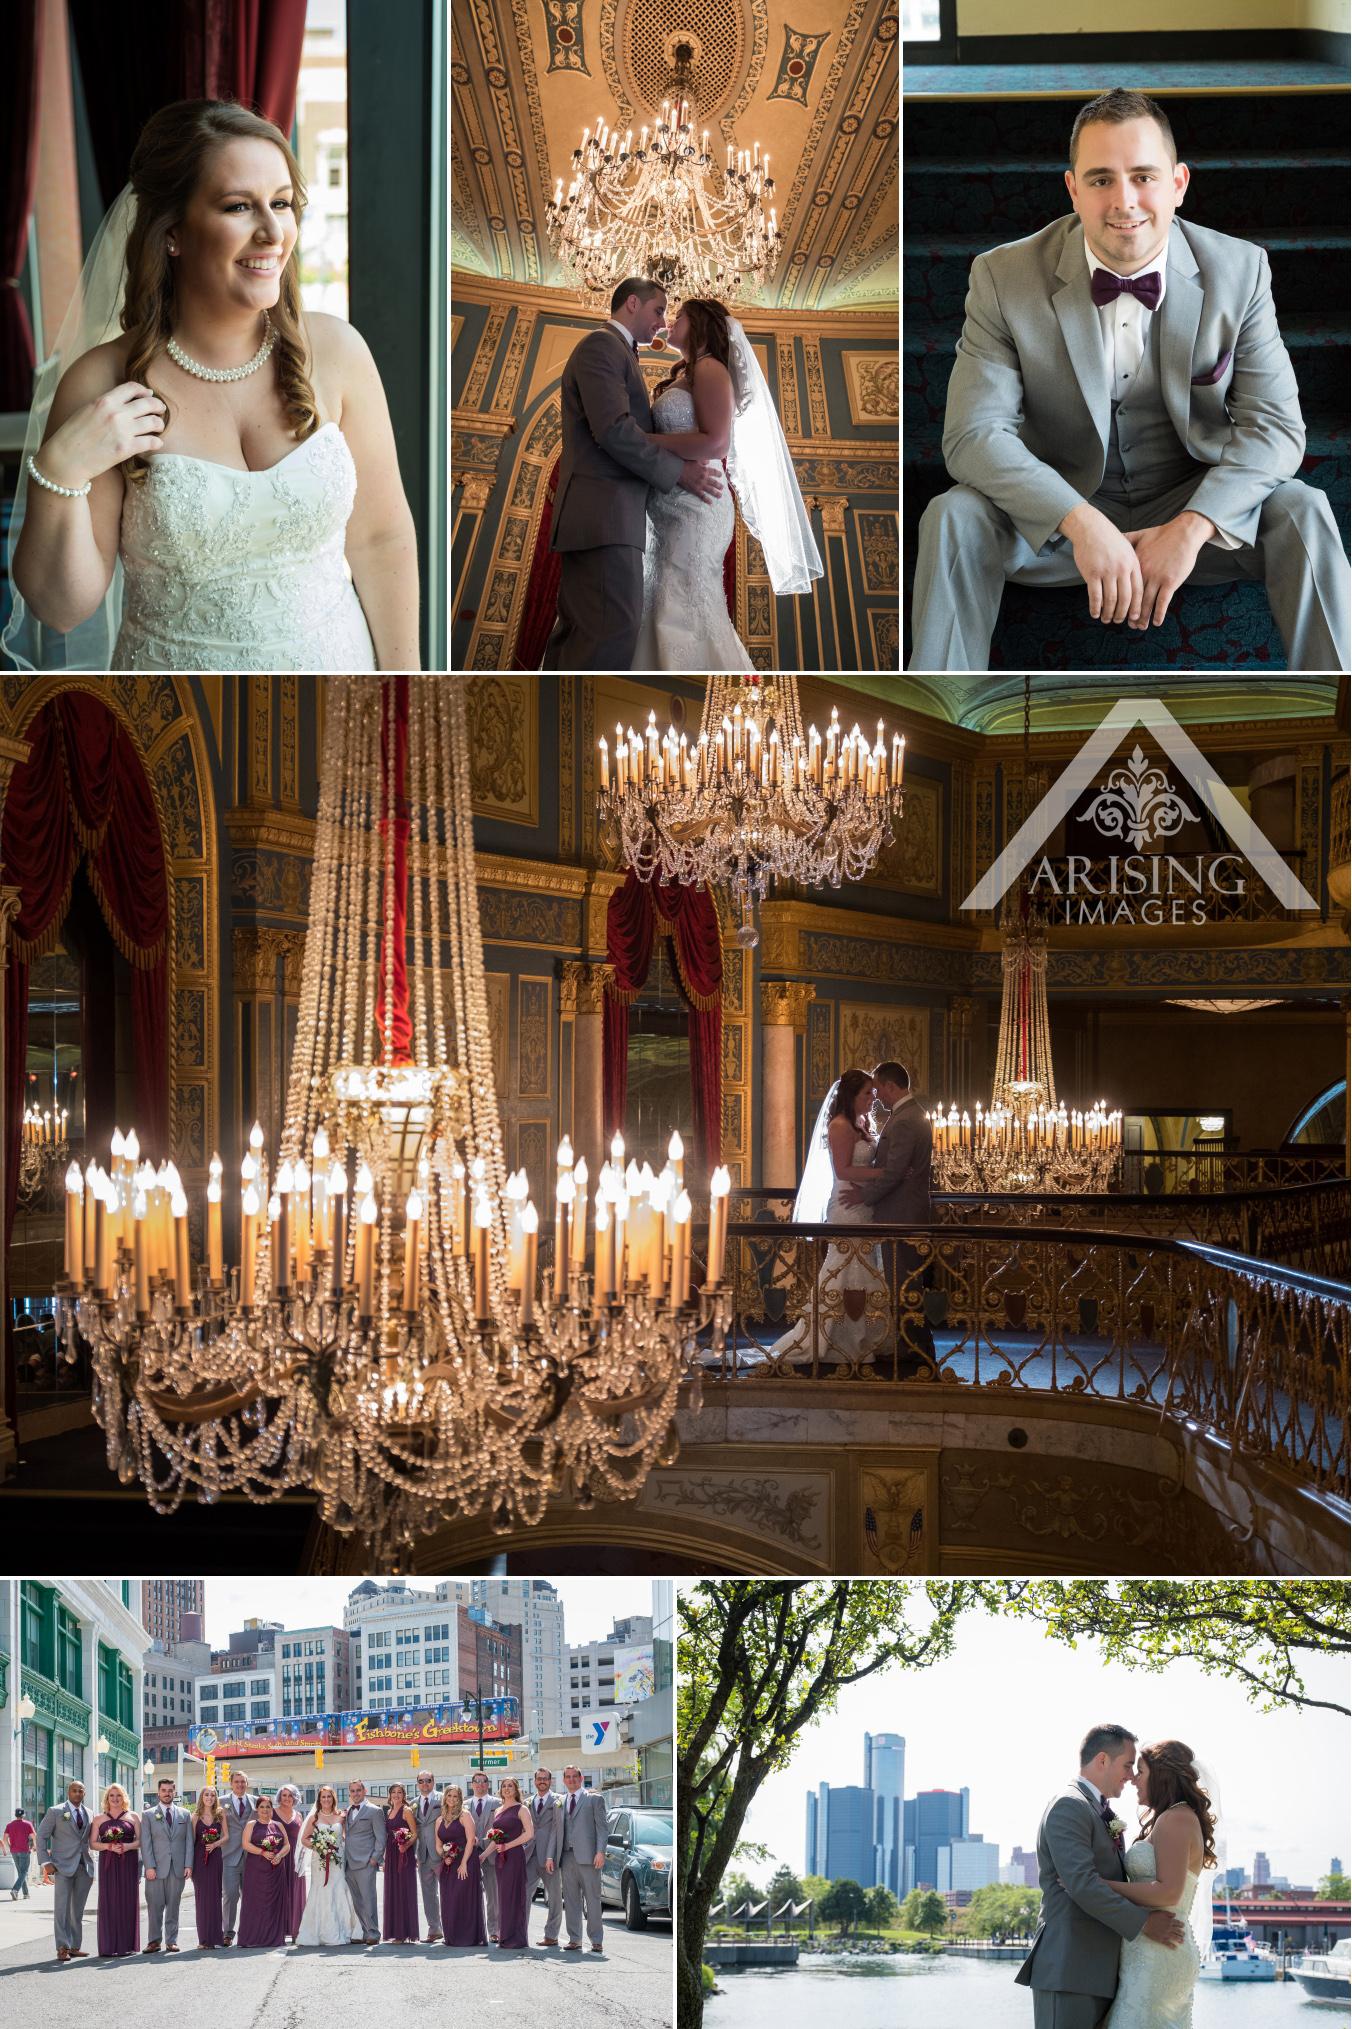 Detroit Opera House Wedding Photography